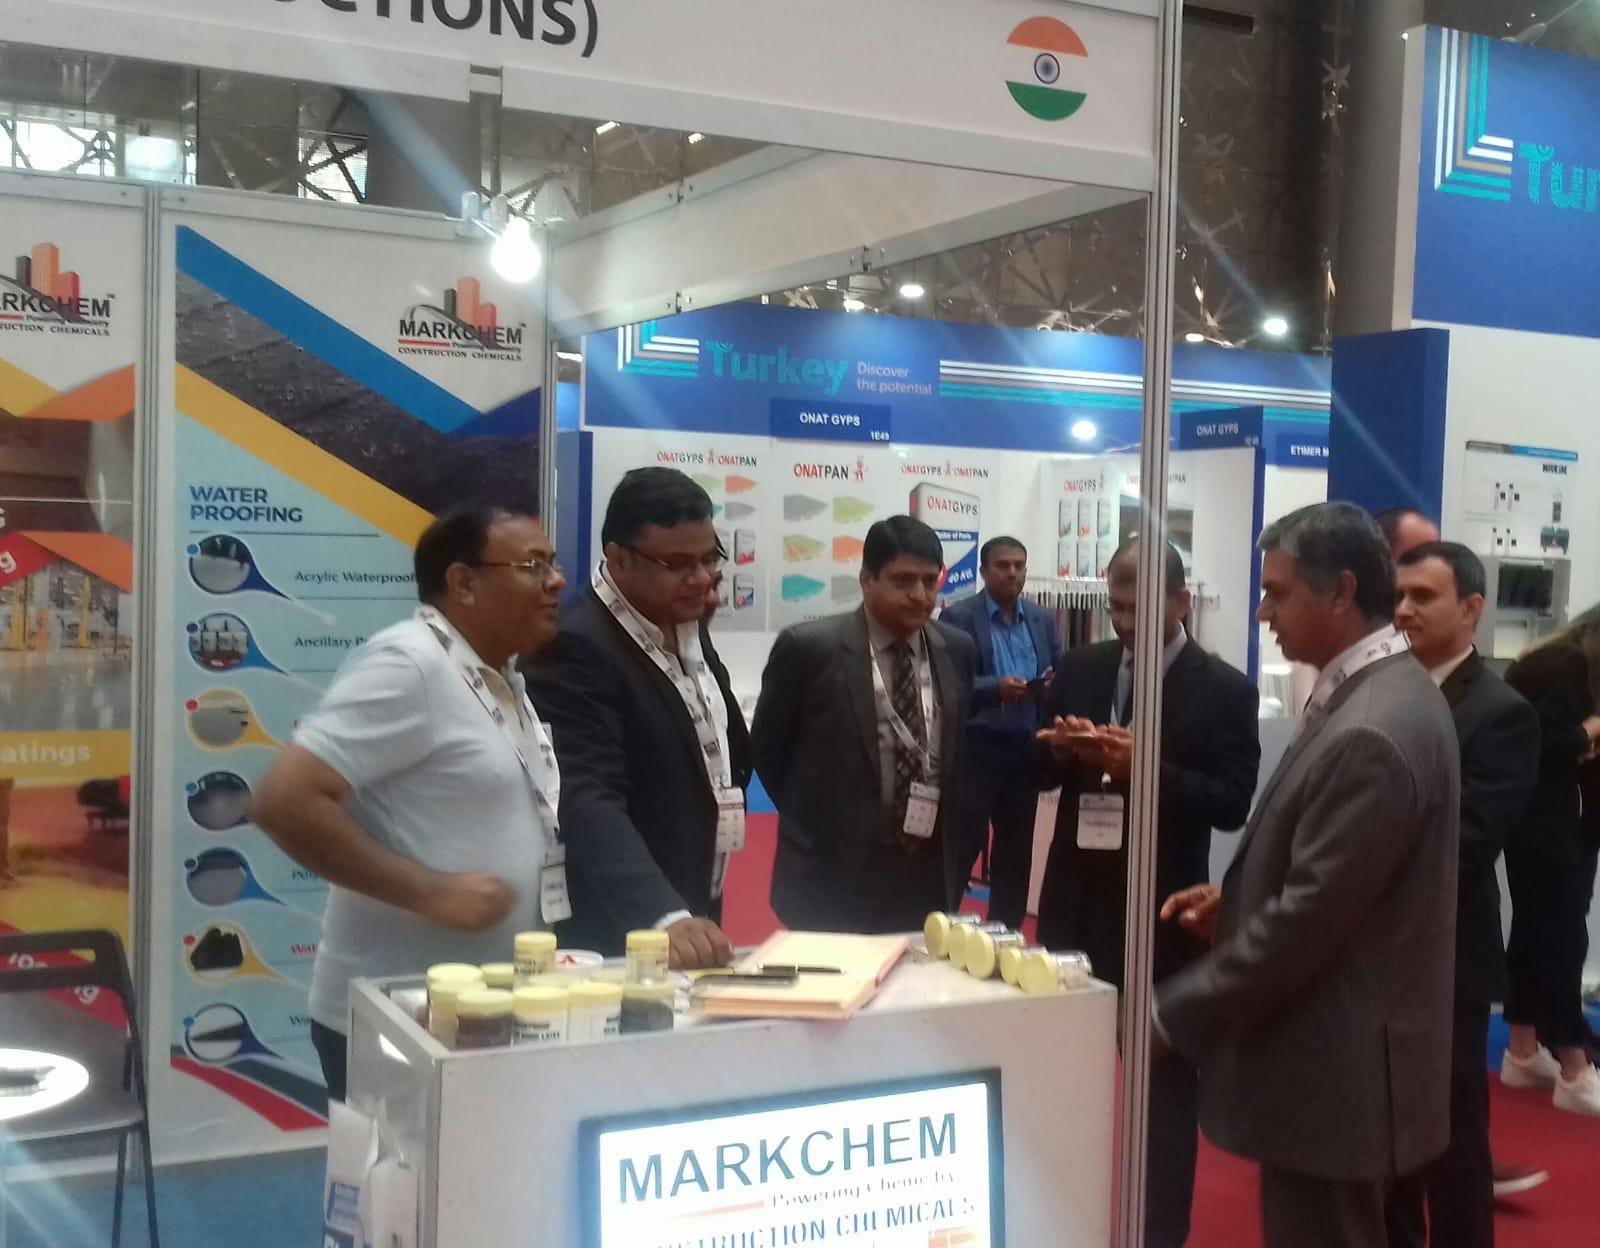 Indian Ambassdor P Kumaran interacting with one of the Indian exhibitors.